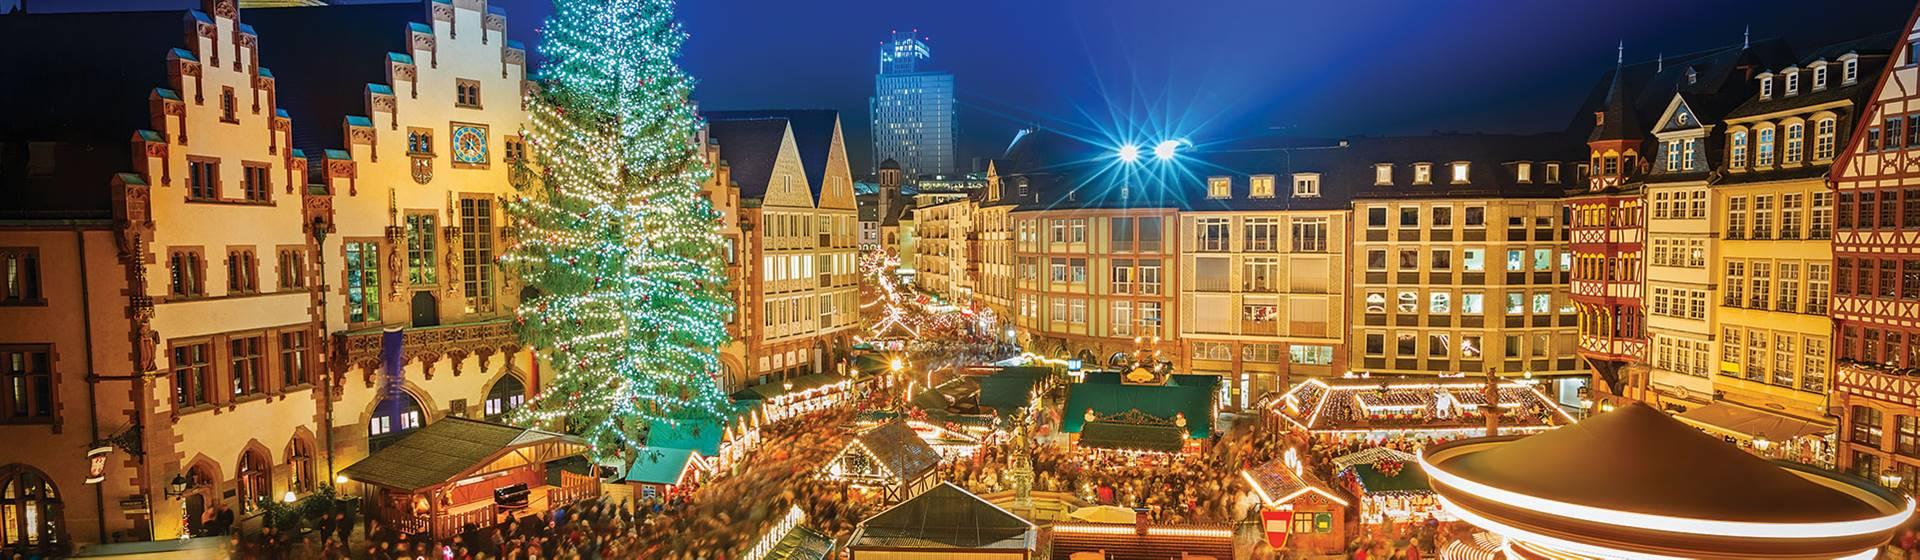 Rudesheim & Frankfurt Christmas Markets